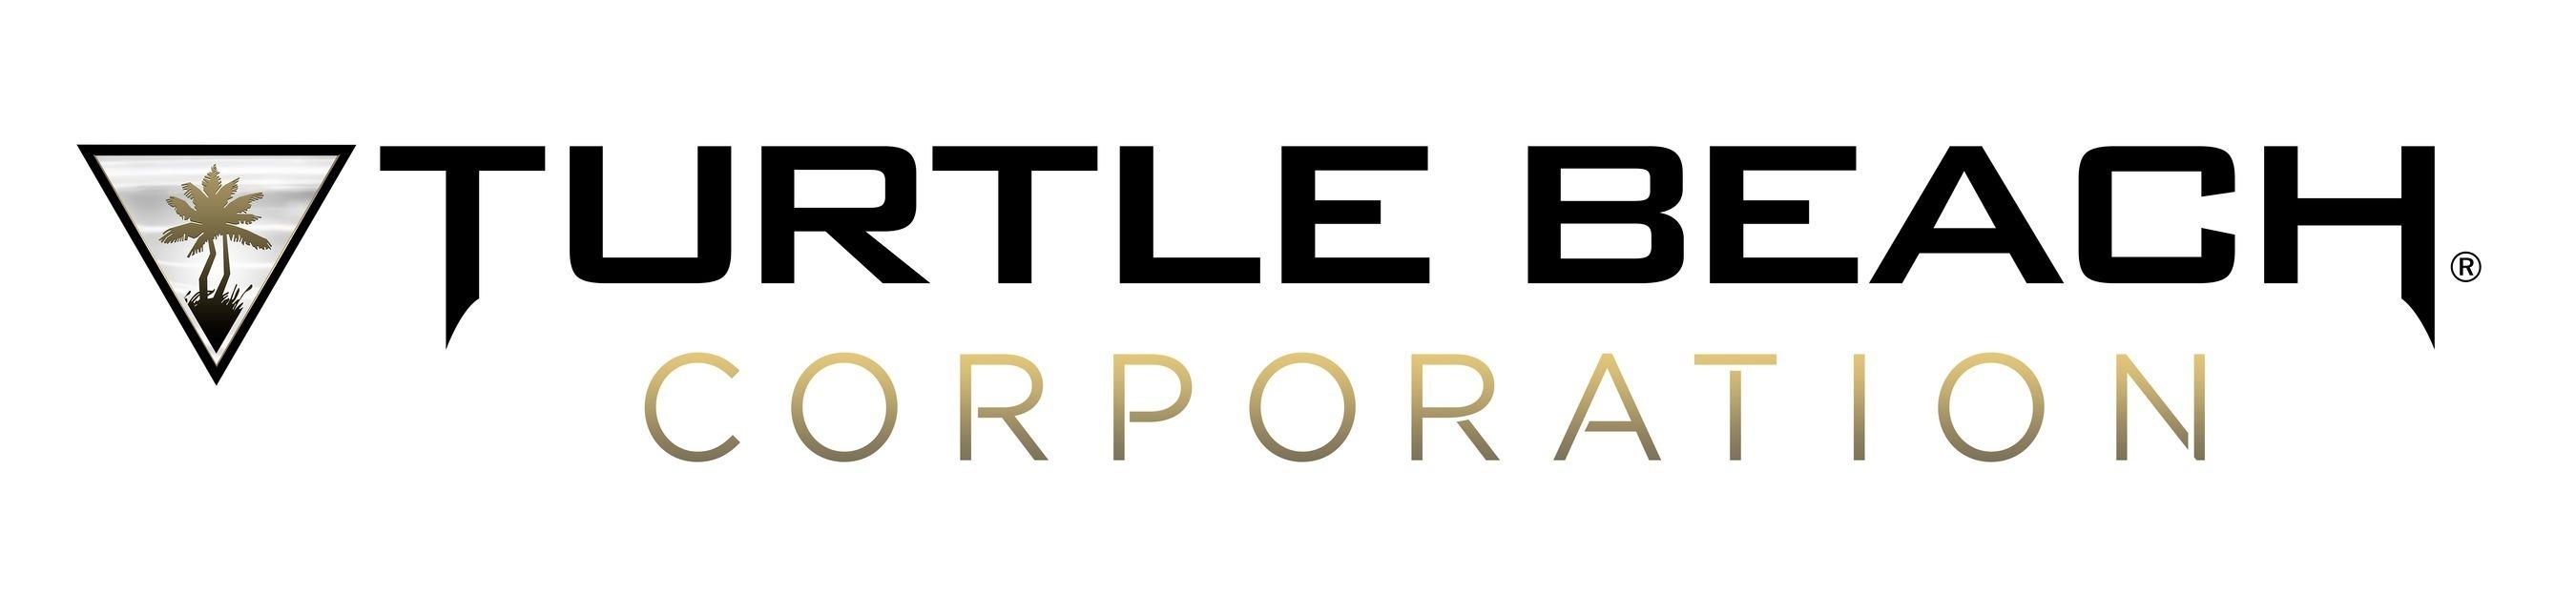 Turtle Beach Corporation